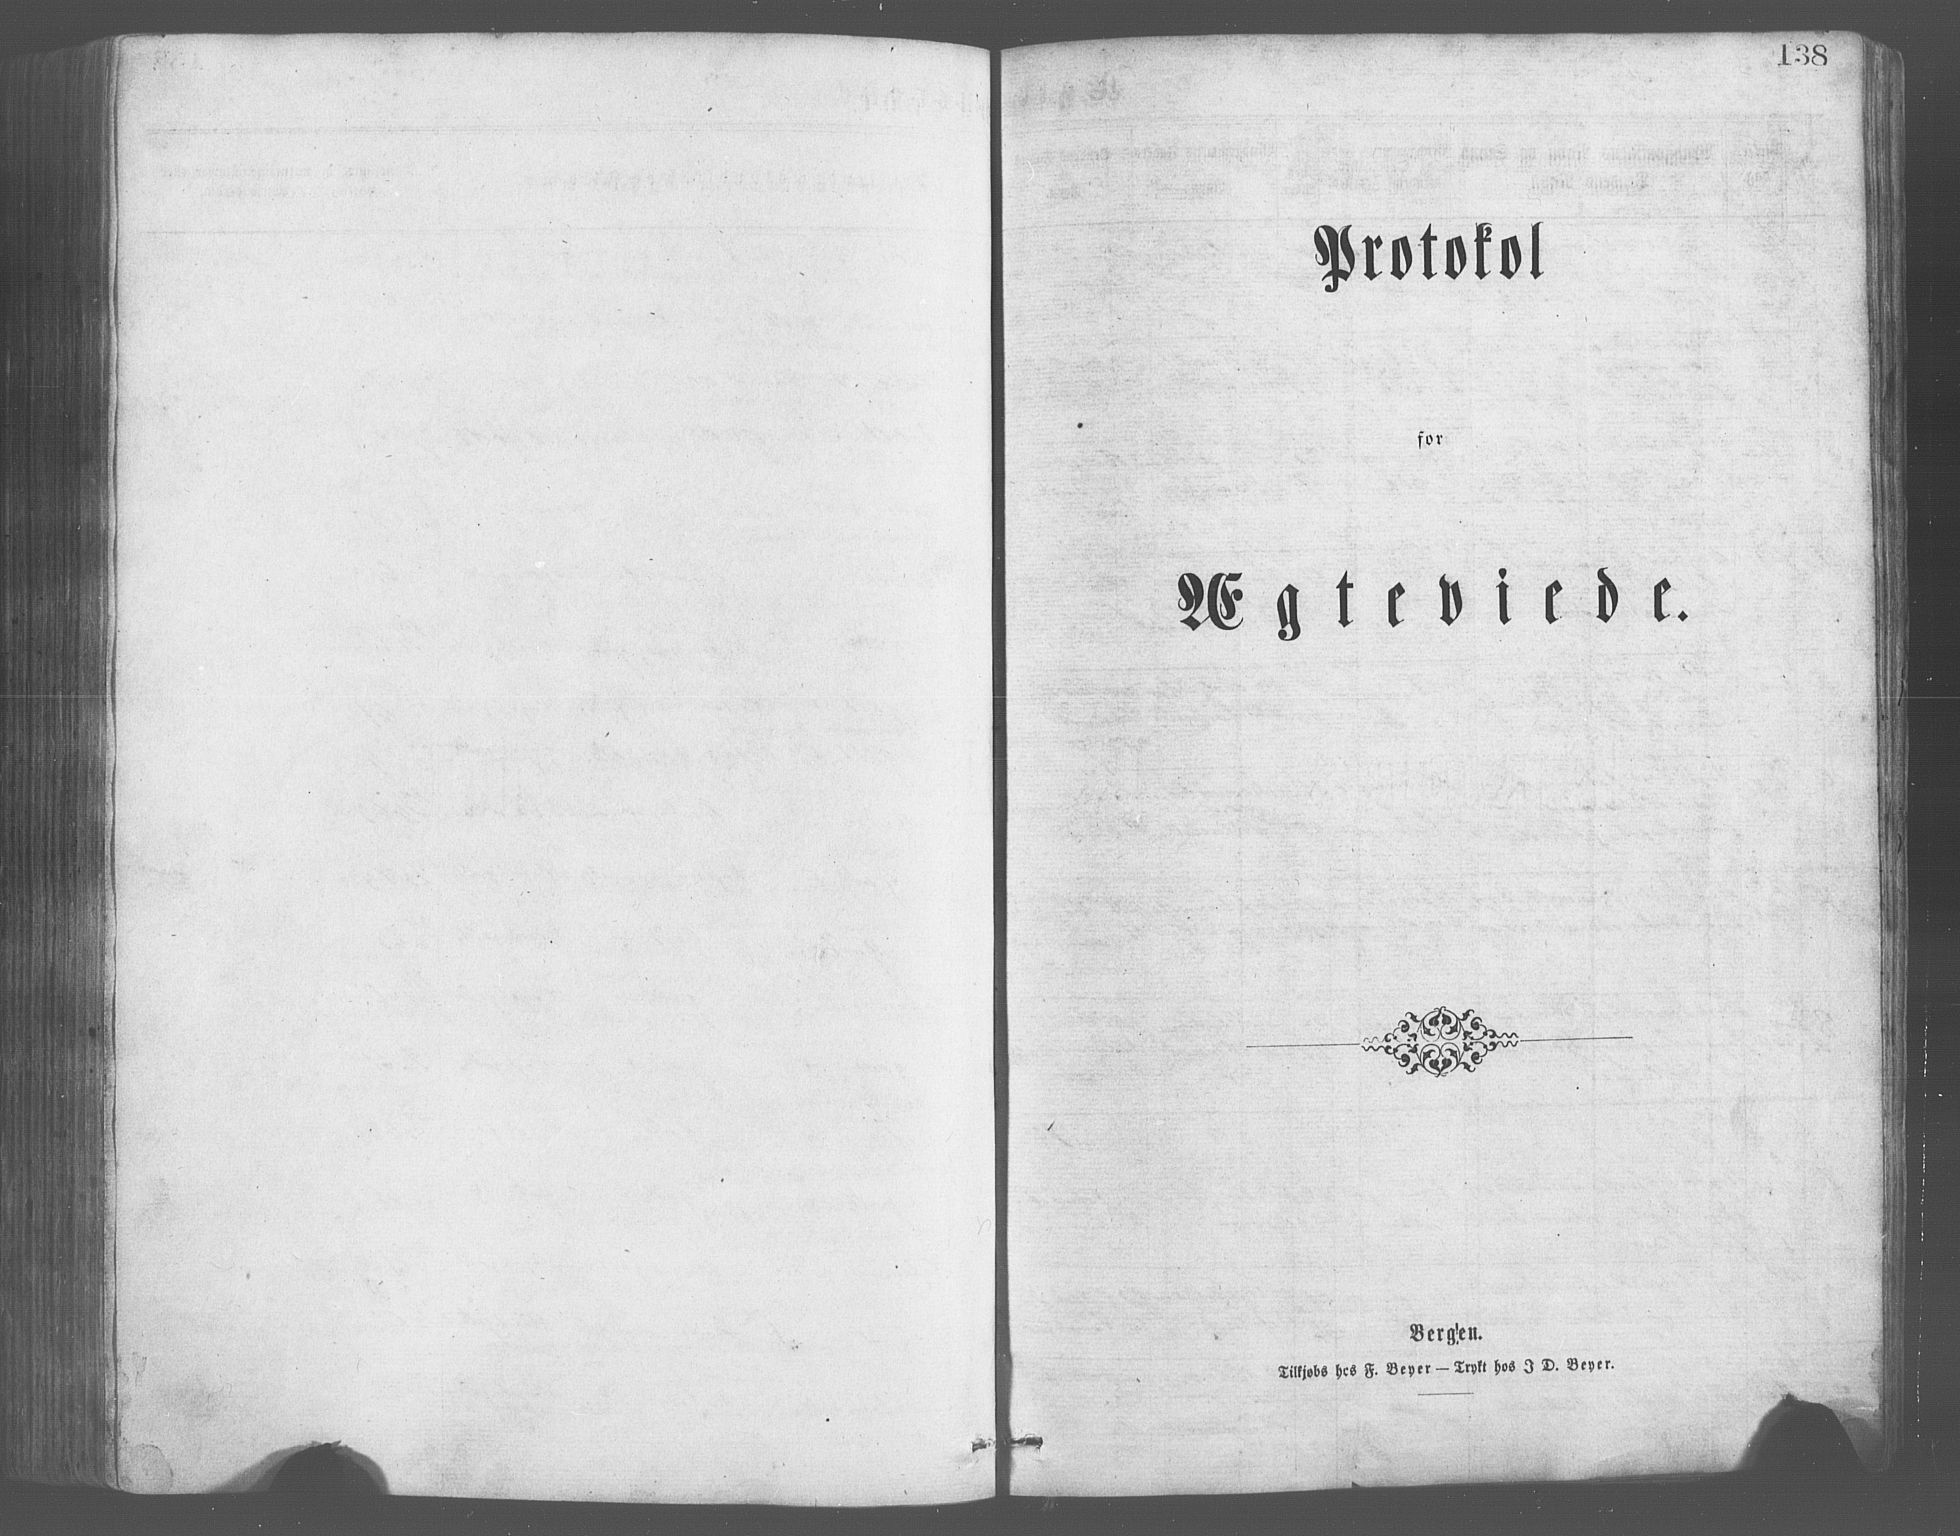 SAB, Evanger sokneprestembete*, Parish register (copy) no. A 2, 1863-1879, p. 138